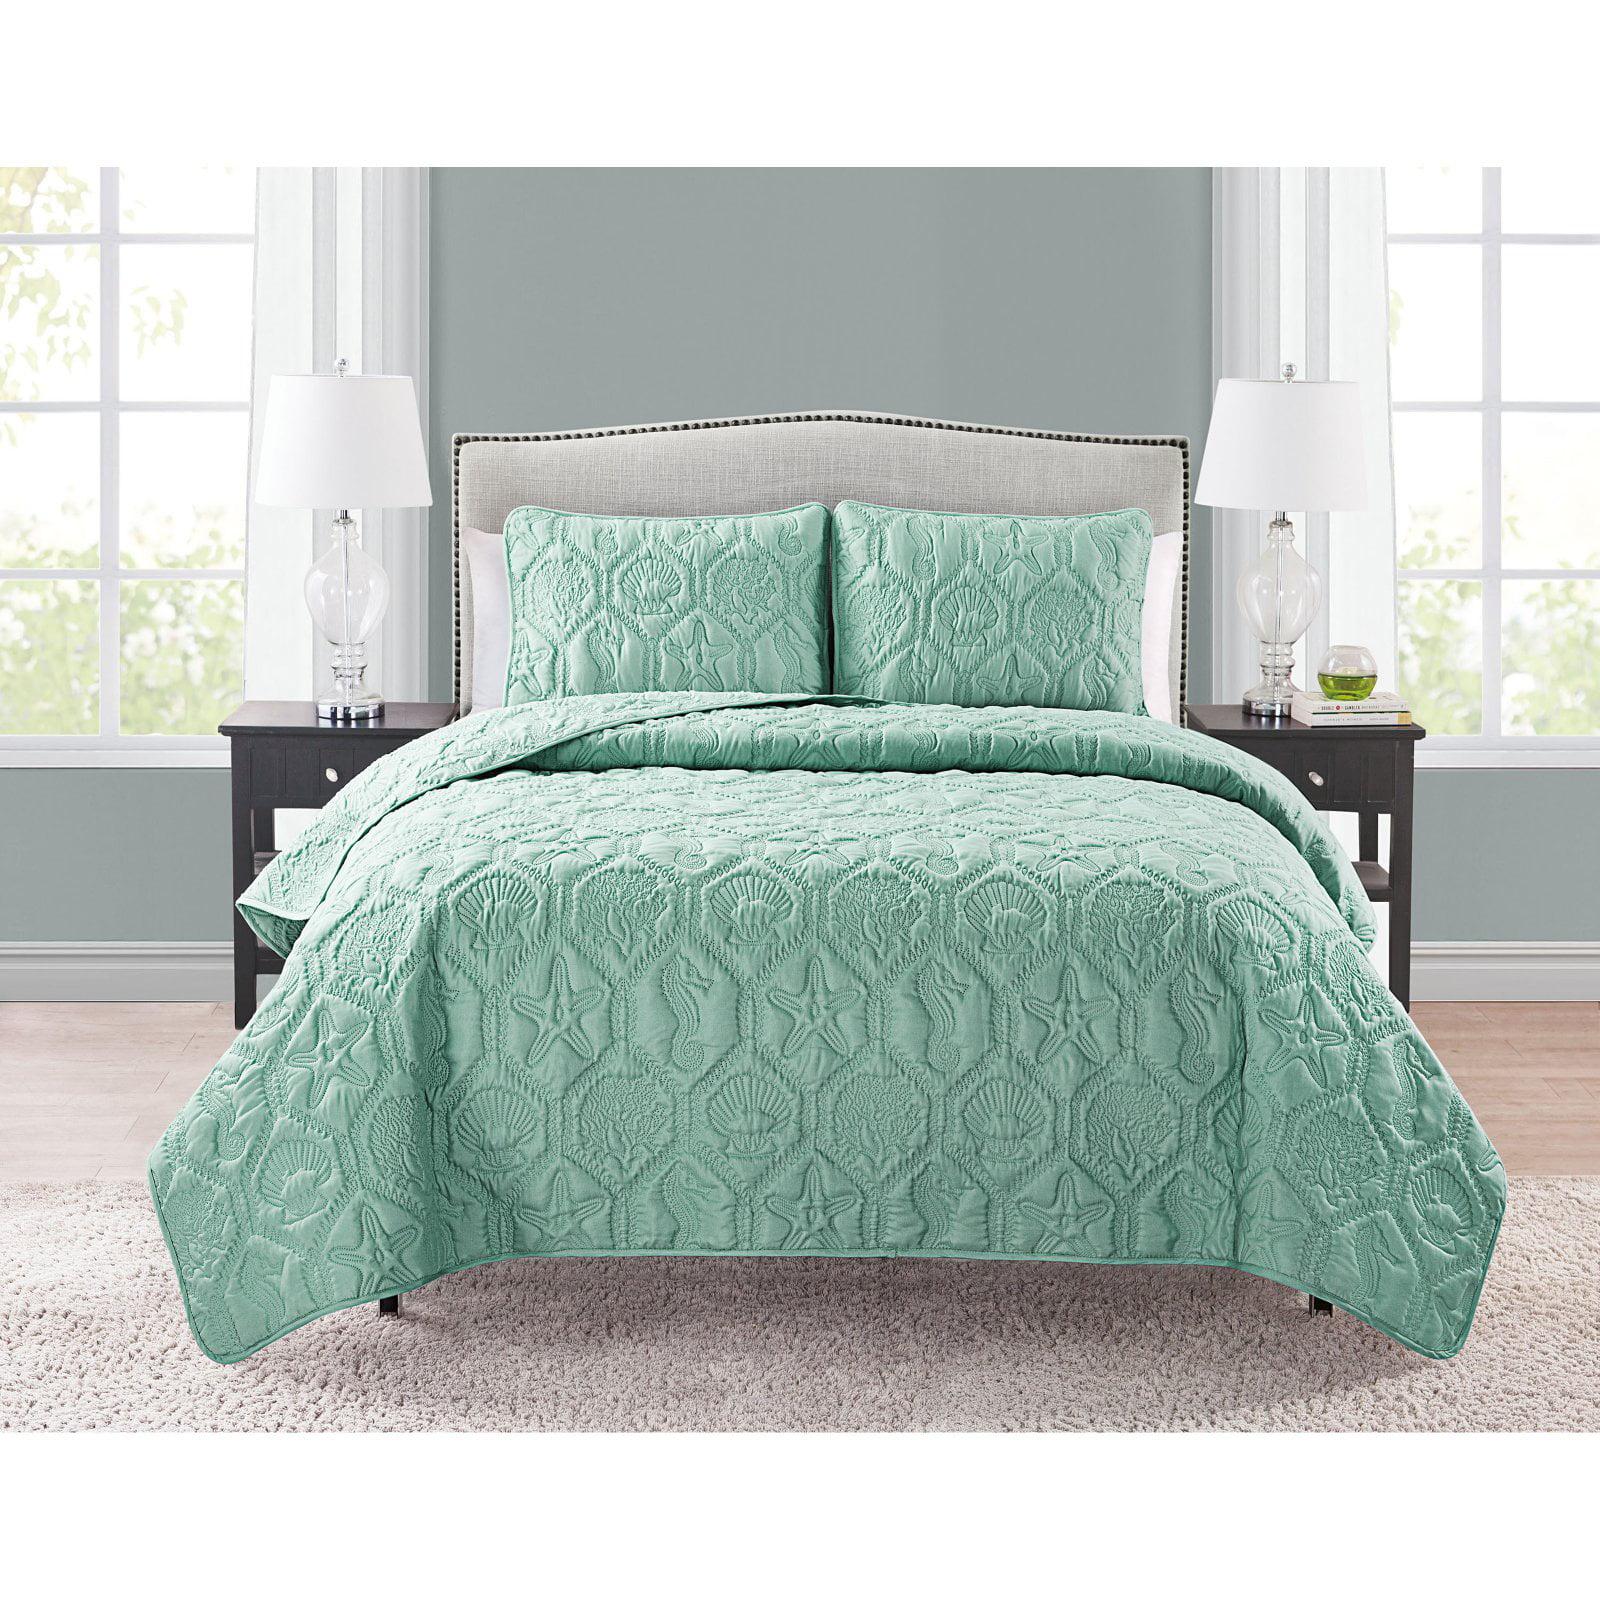 VCNY Home Shore 3-Piece Bedding Quilt Set, Multiple Colors Available